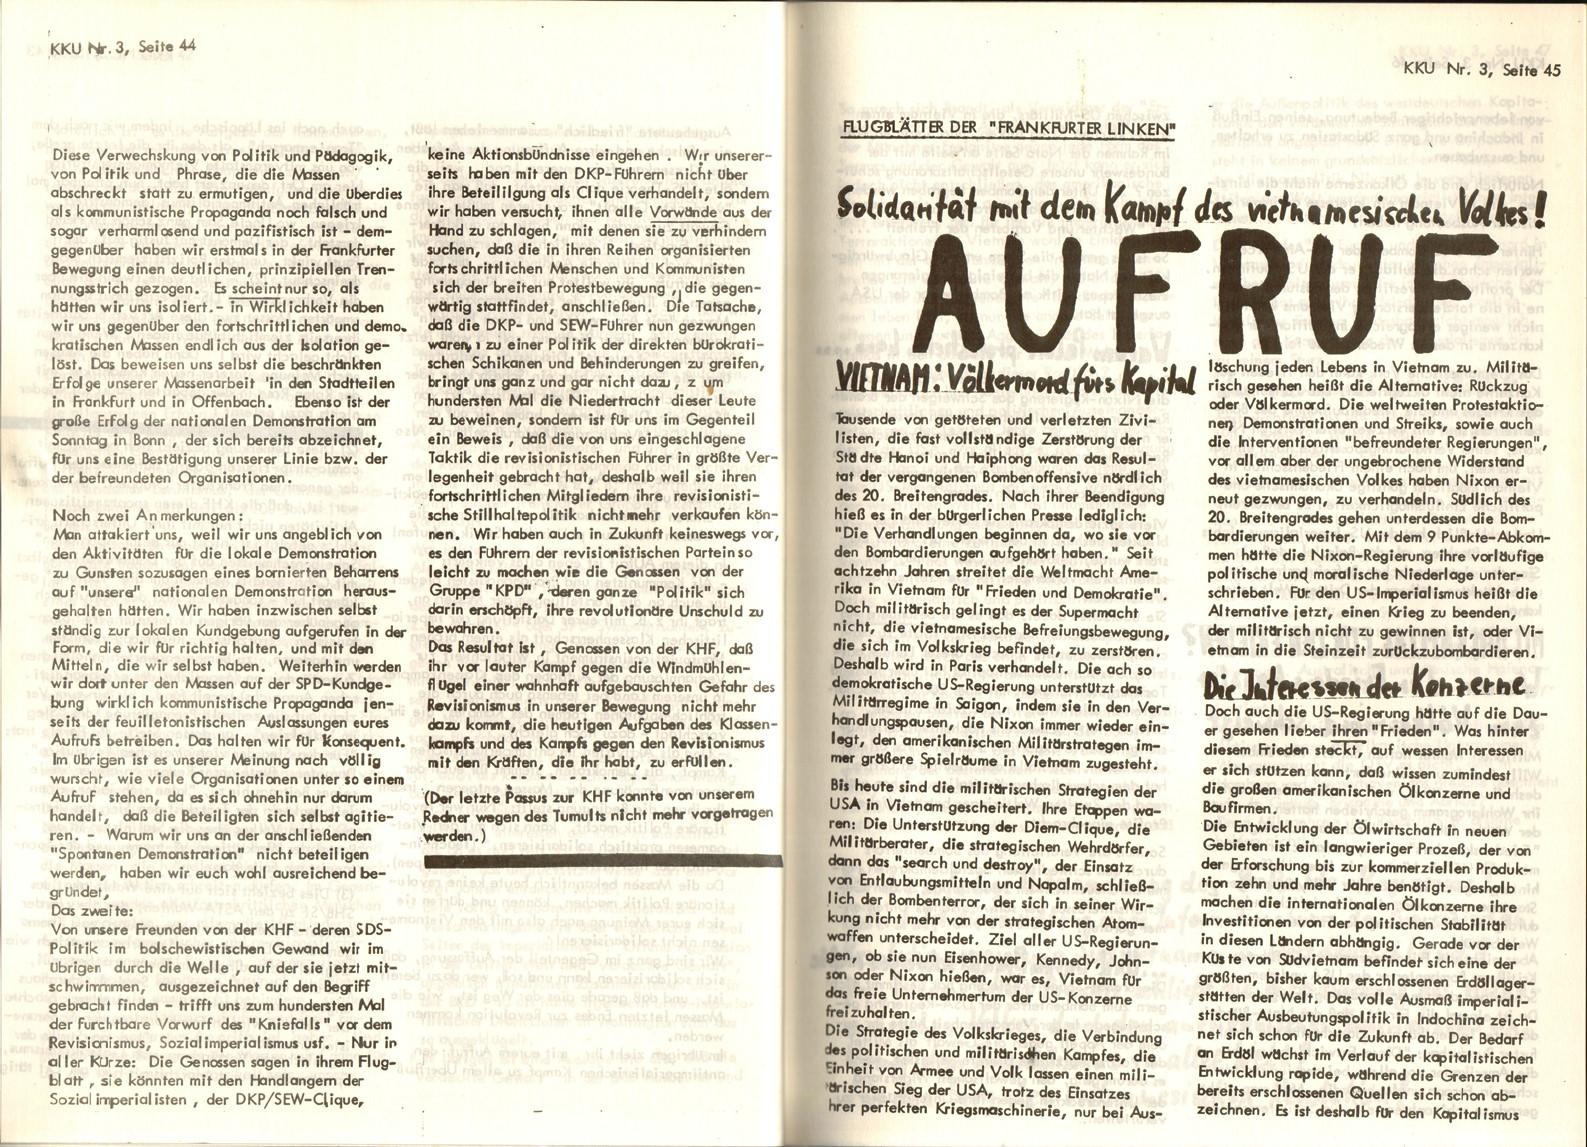 Frankfurt_Offenbach_KG_Kampf_Kritik_Umgestaltung_1973_03_24